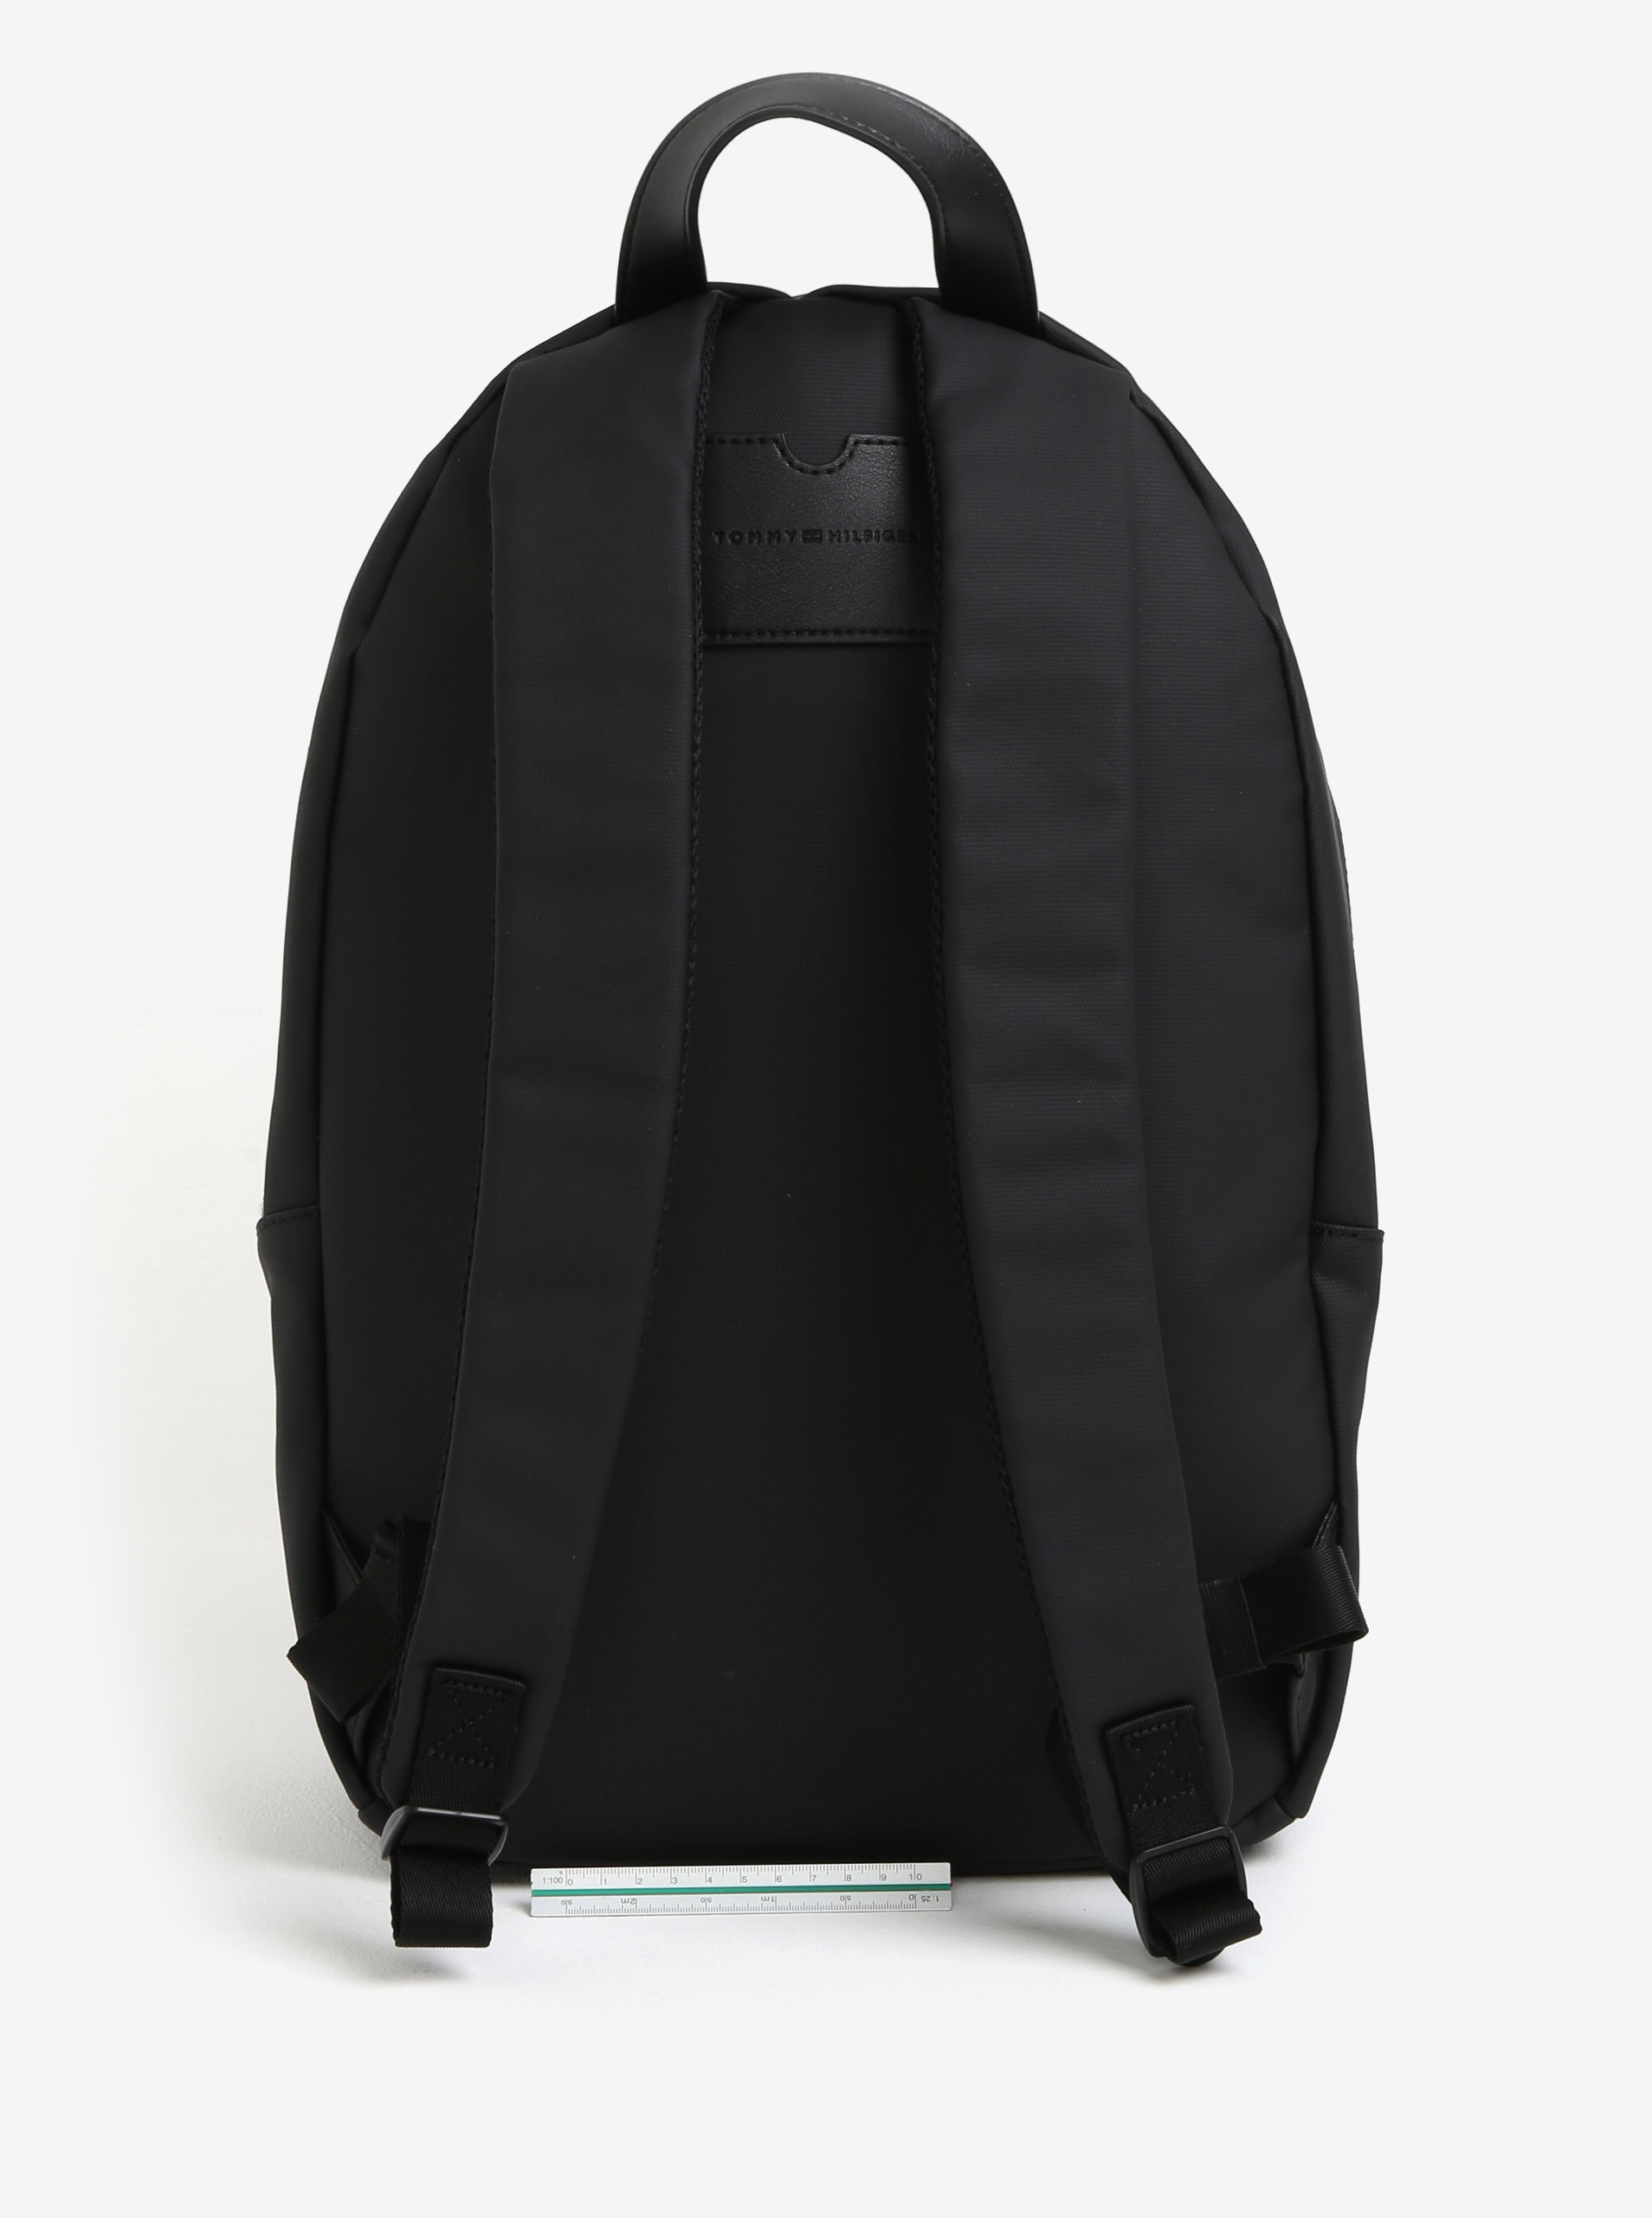 Černý pánský batoh Tommy Hilfiger Elevated ... 9574cd216bf